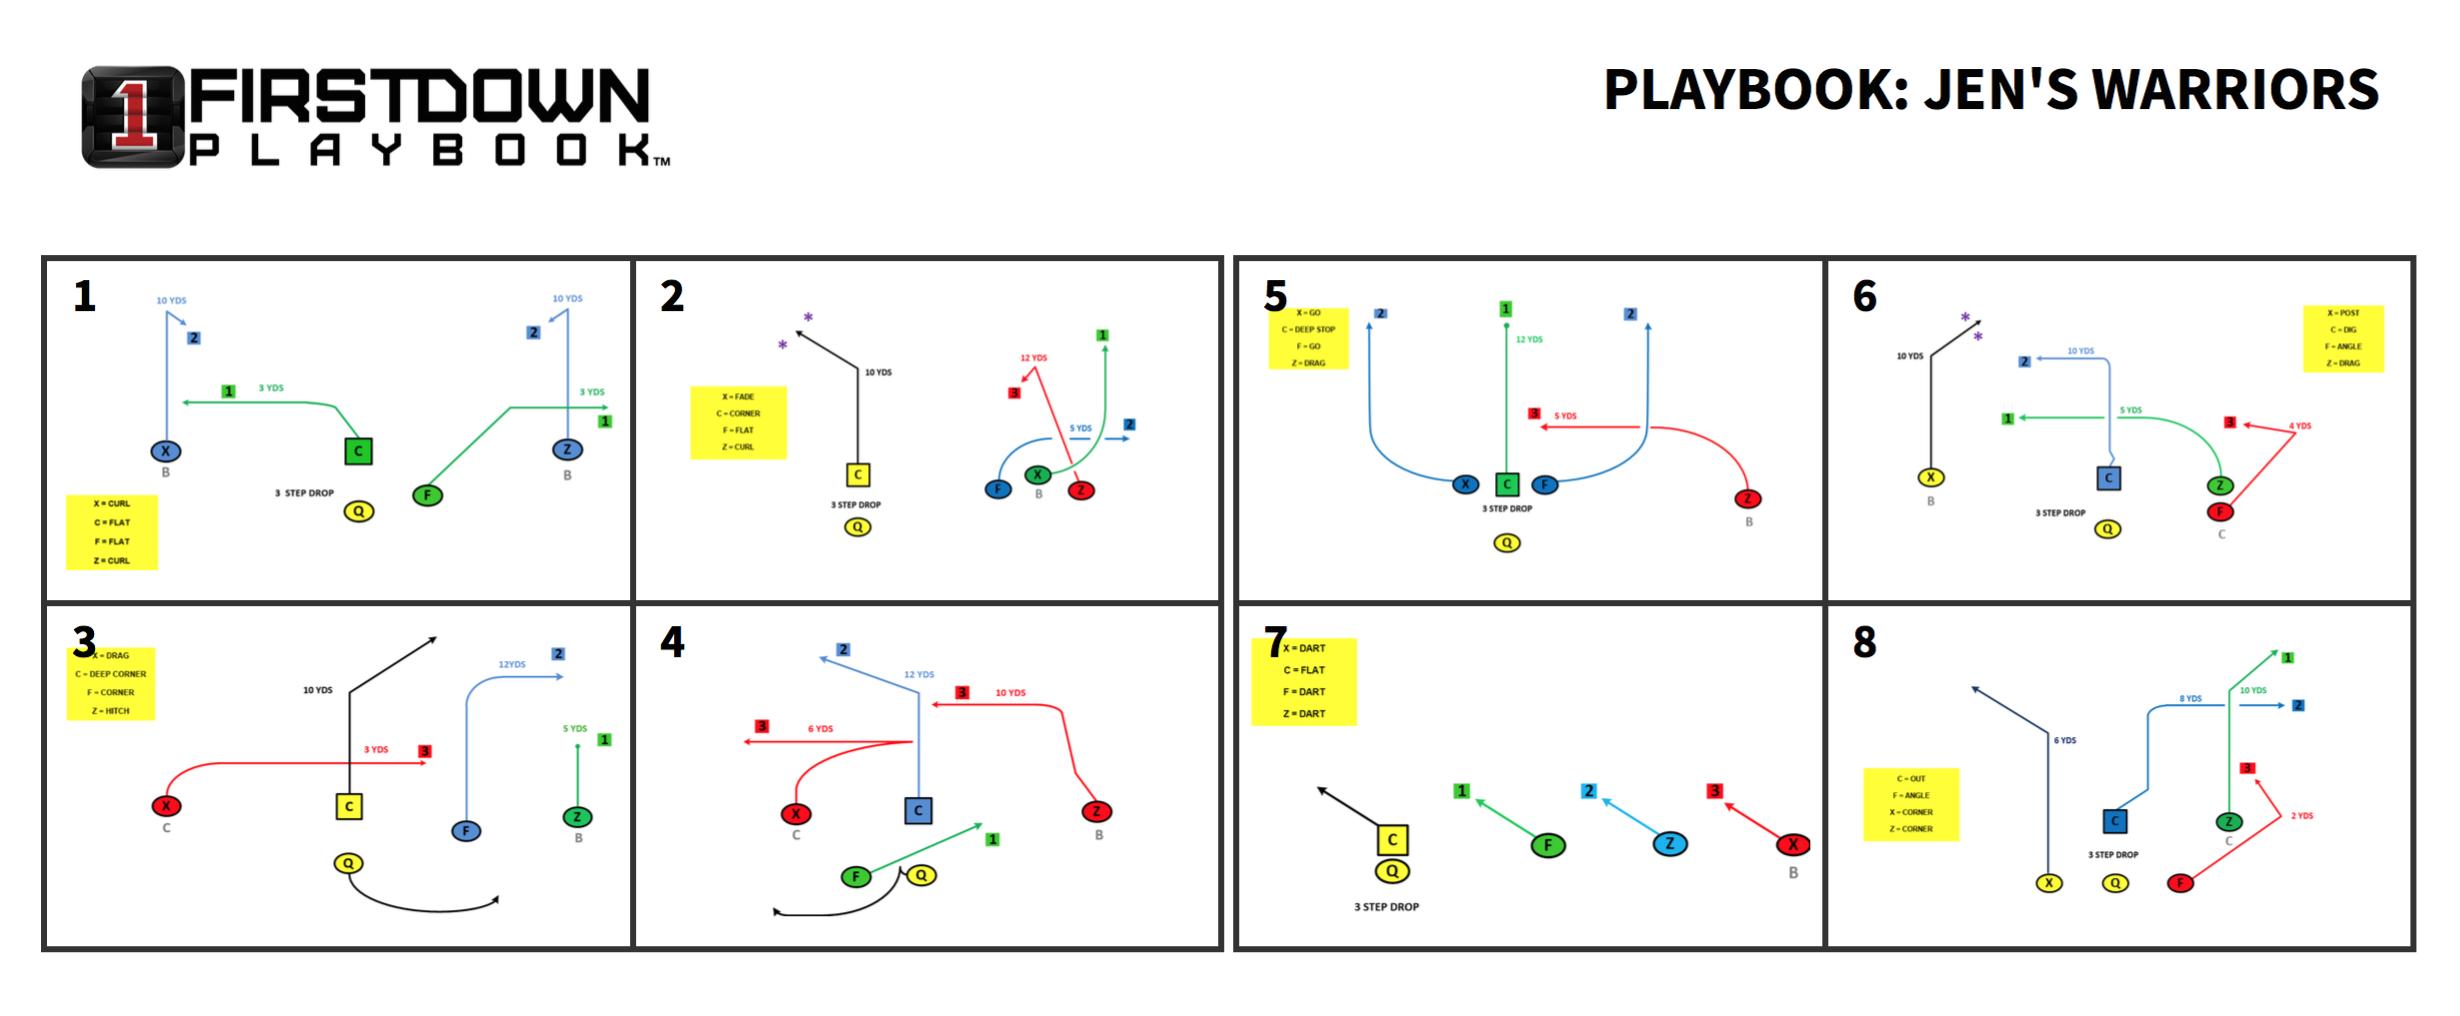 4V4, 5V5, 6V6 And 7V7 Flag Football Wristband Sheets For Your Team - Free Printable Football Play Sheets